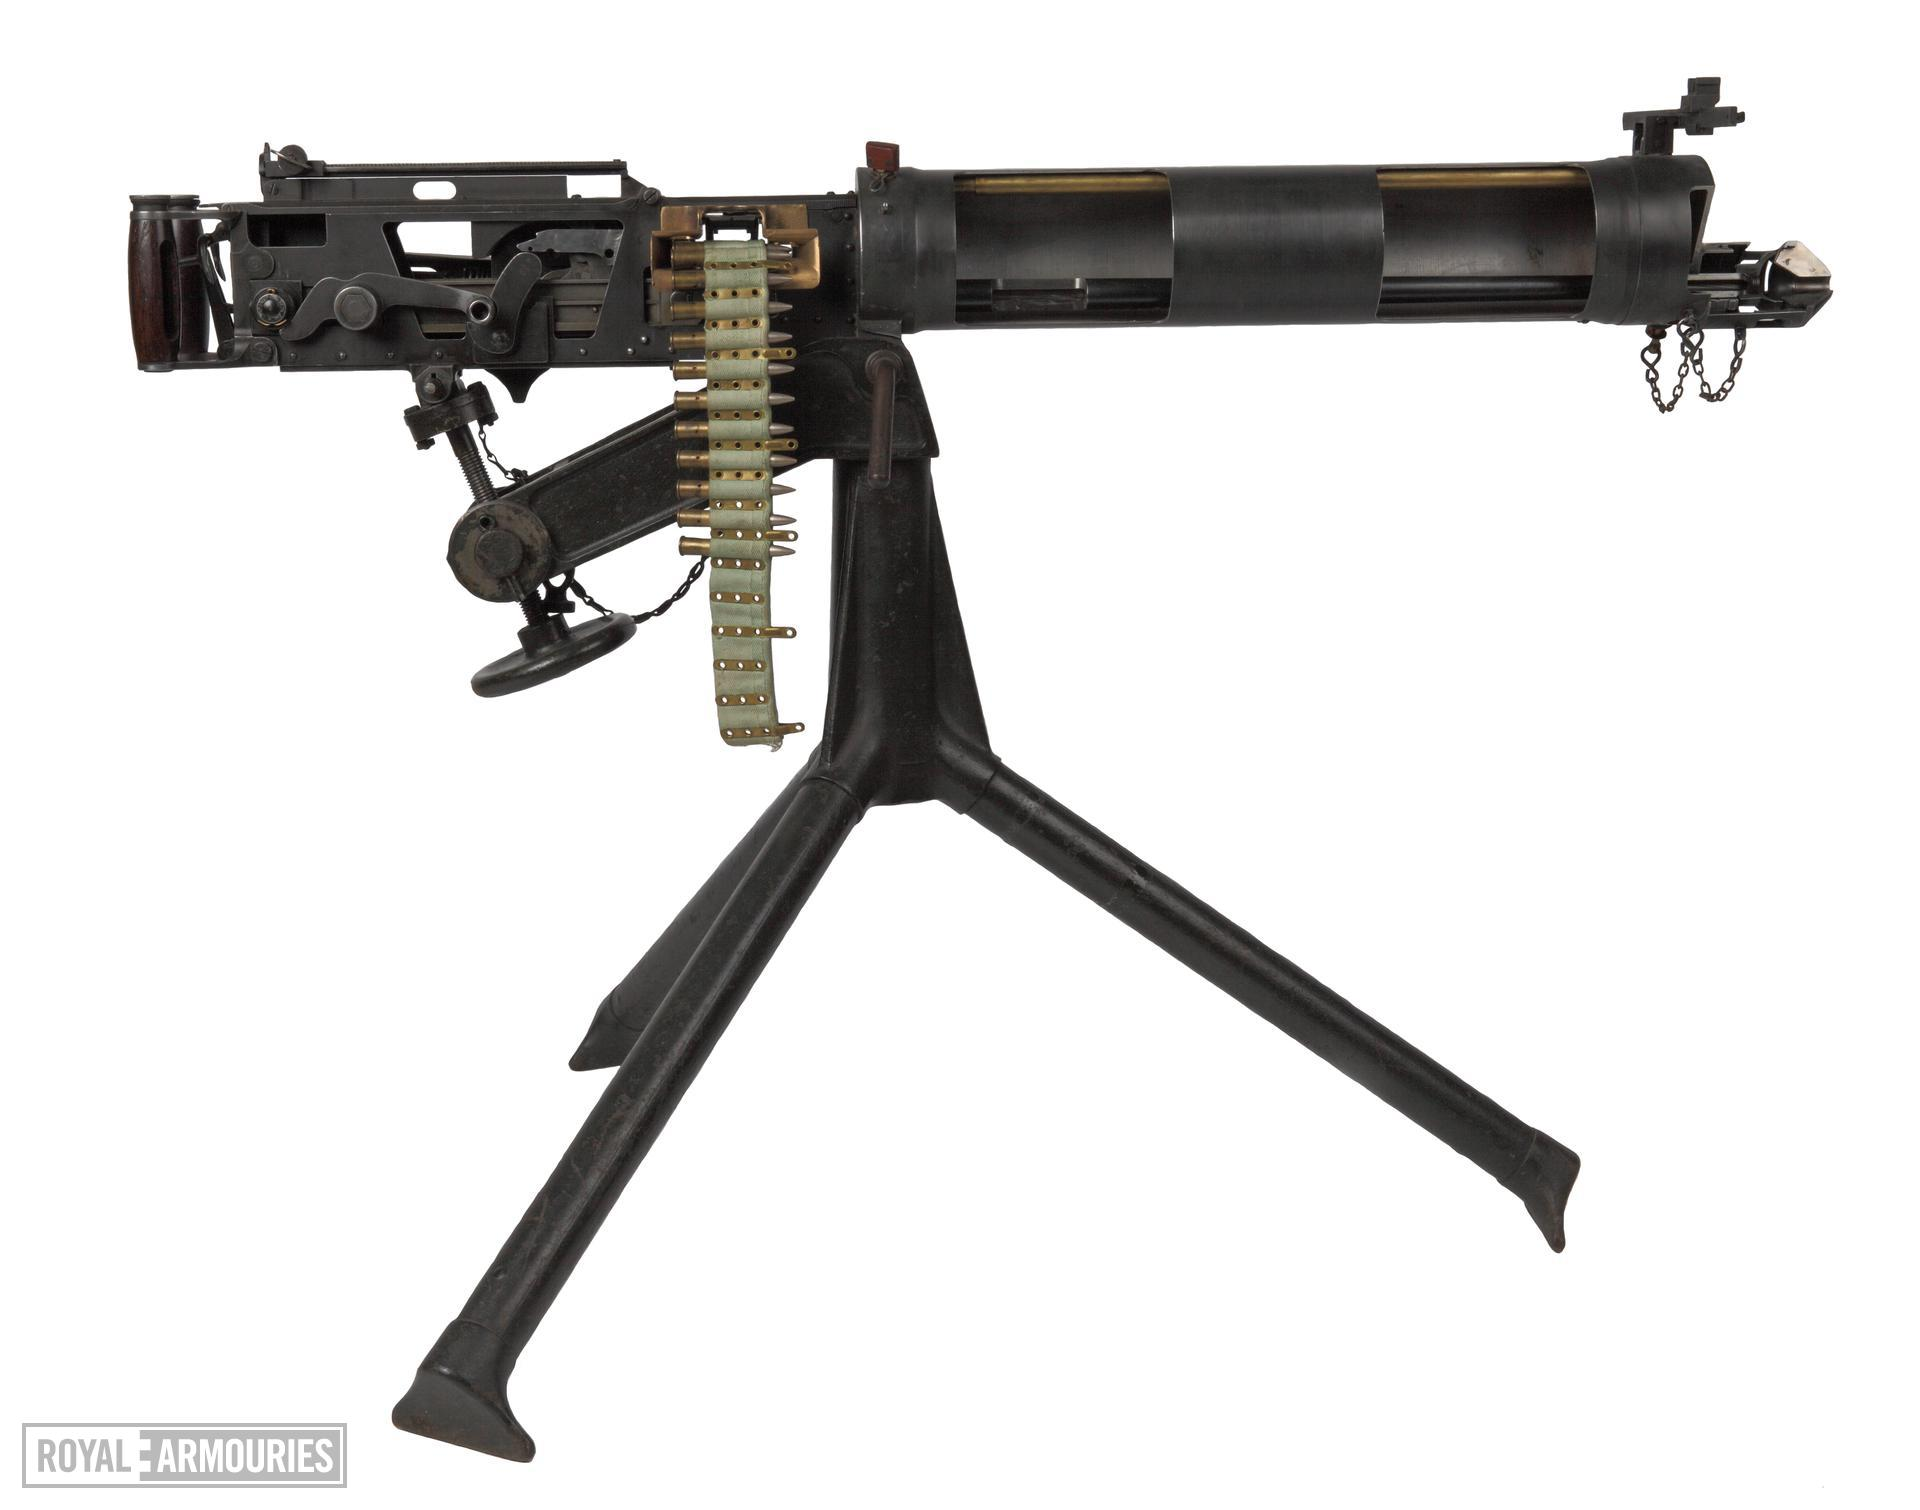 Vickers Mk.I belt-fed military machine gun, Australian, Lithgow, about 194